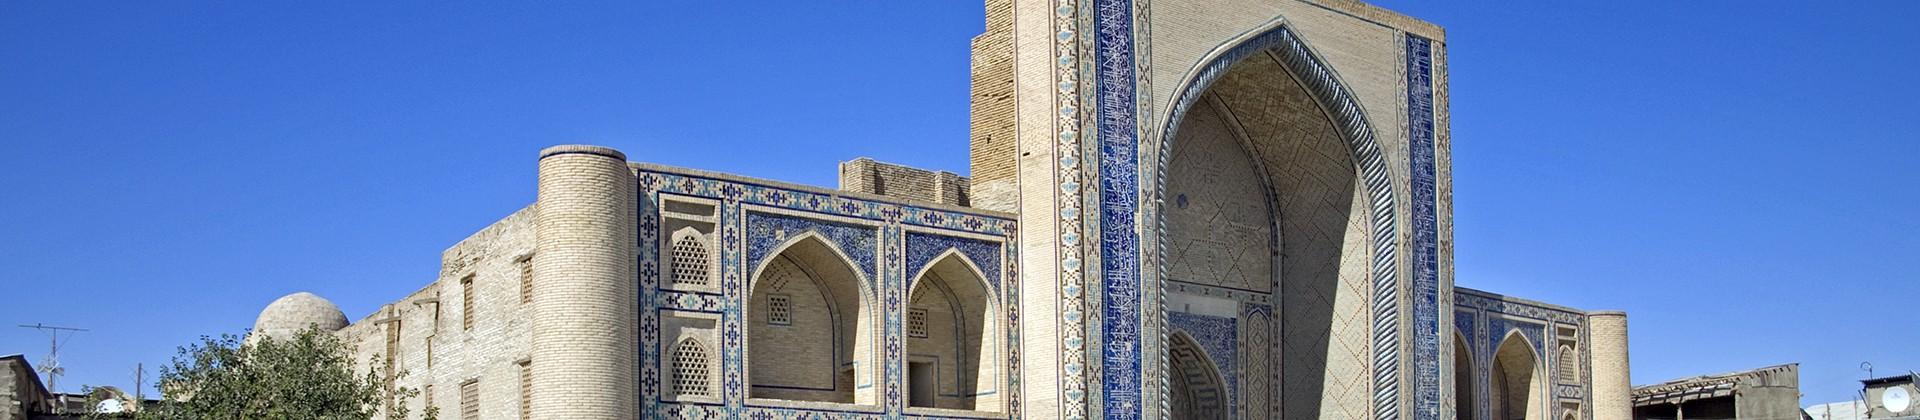 Ulugbek Madrasah - 1